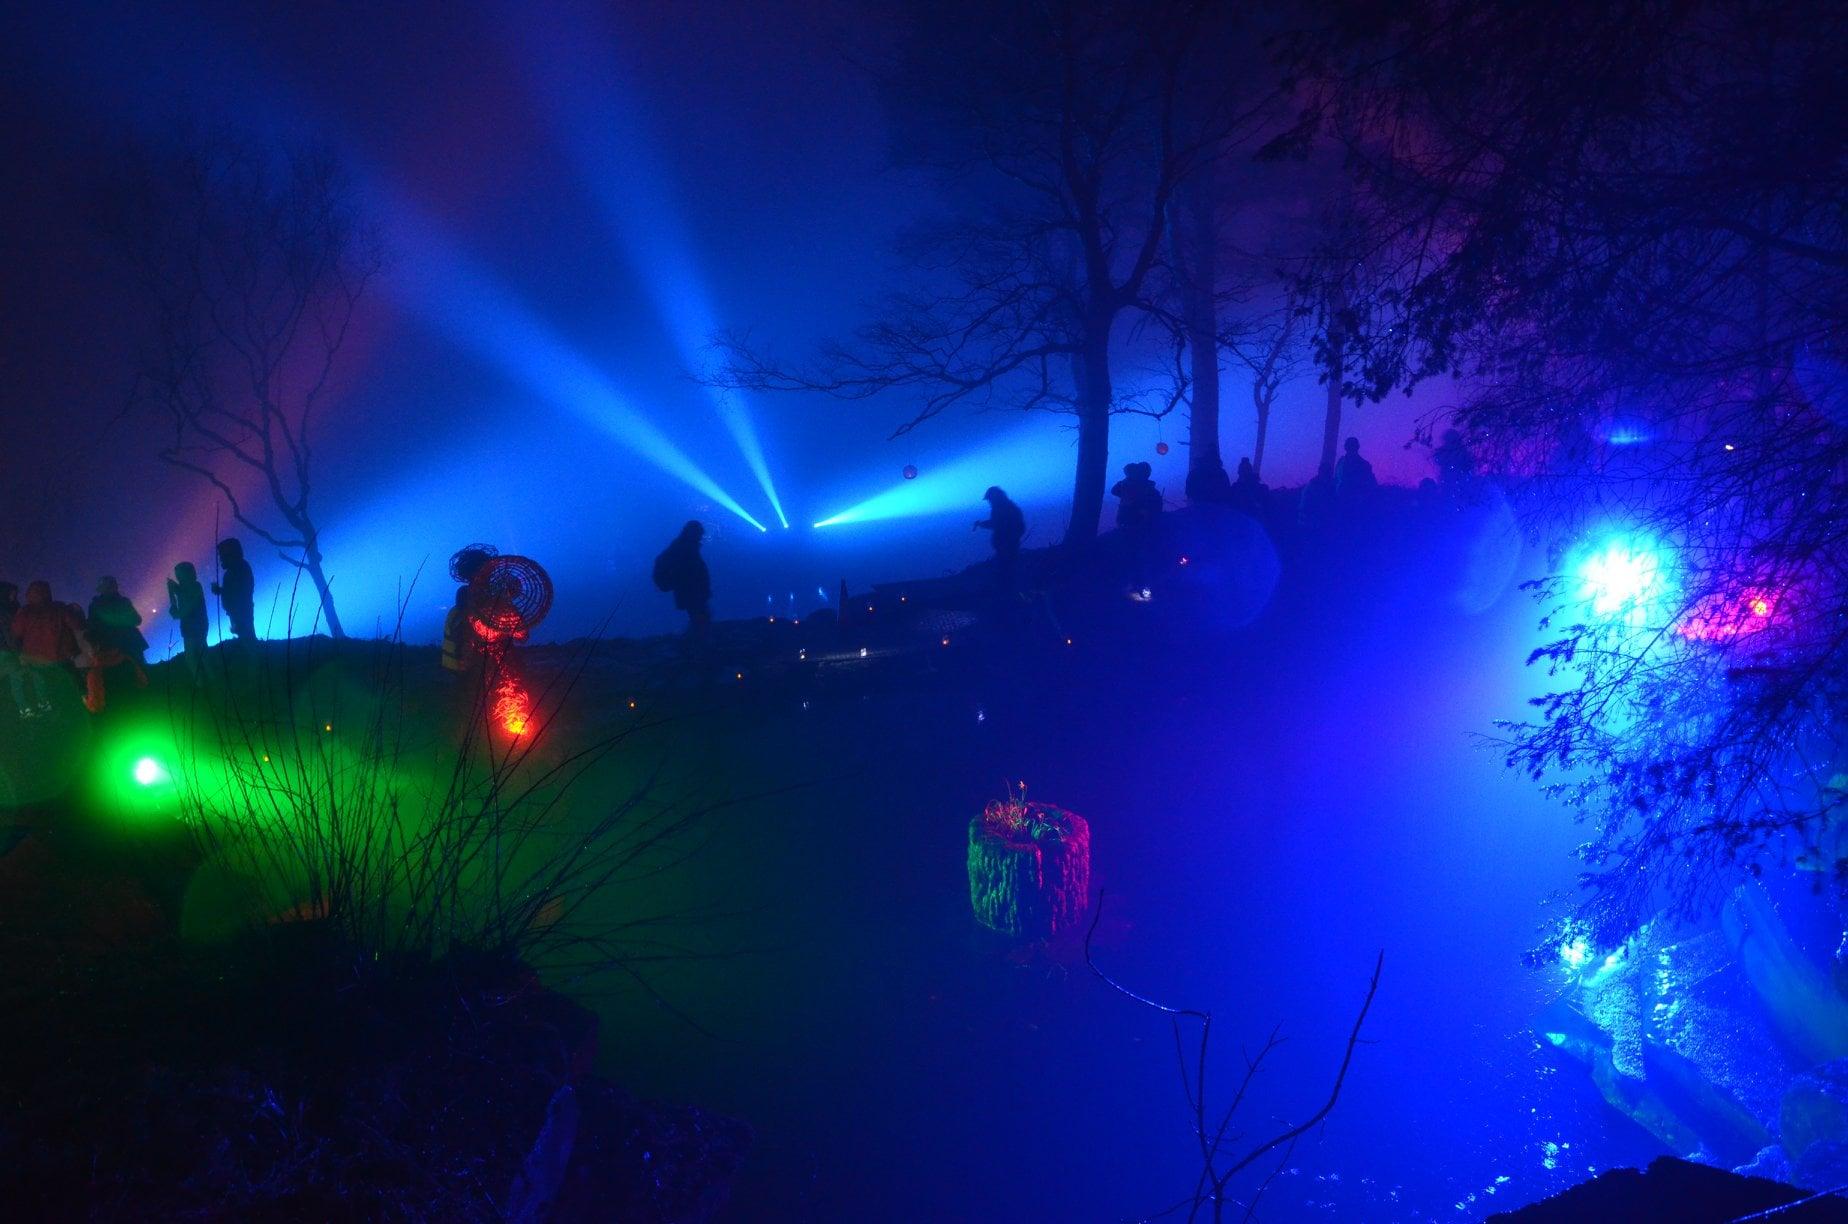 EXTRA NIGHT FOR RIVINGTON'S FESTIVAL OF LIGHT